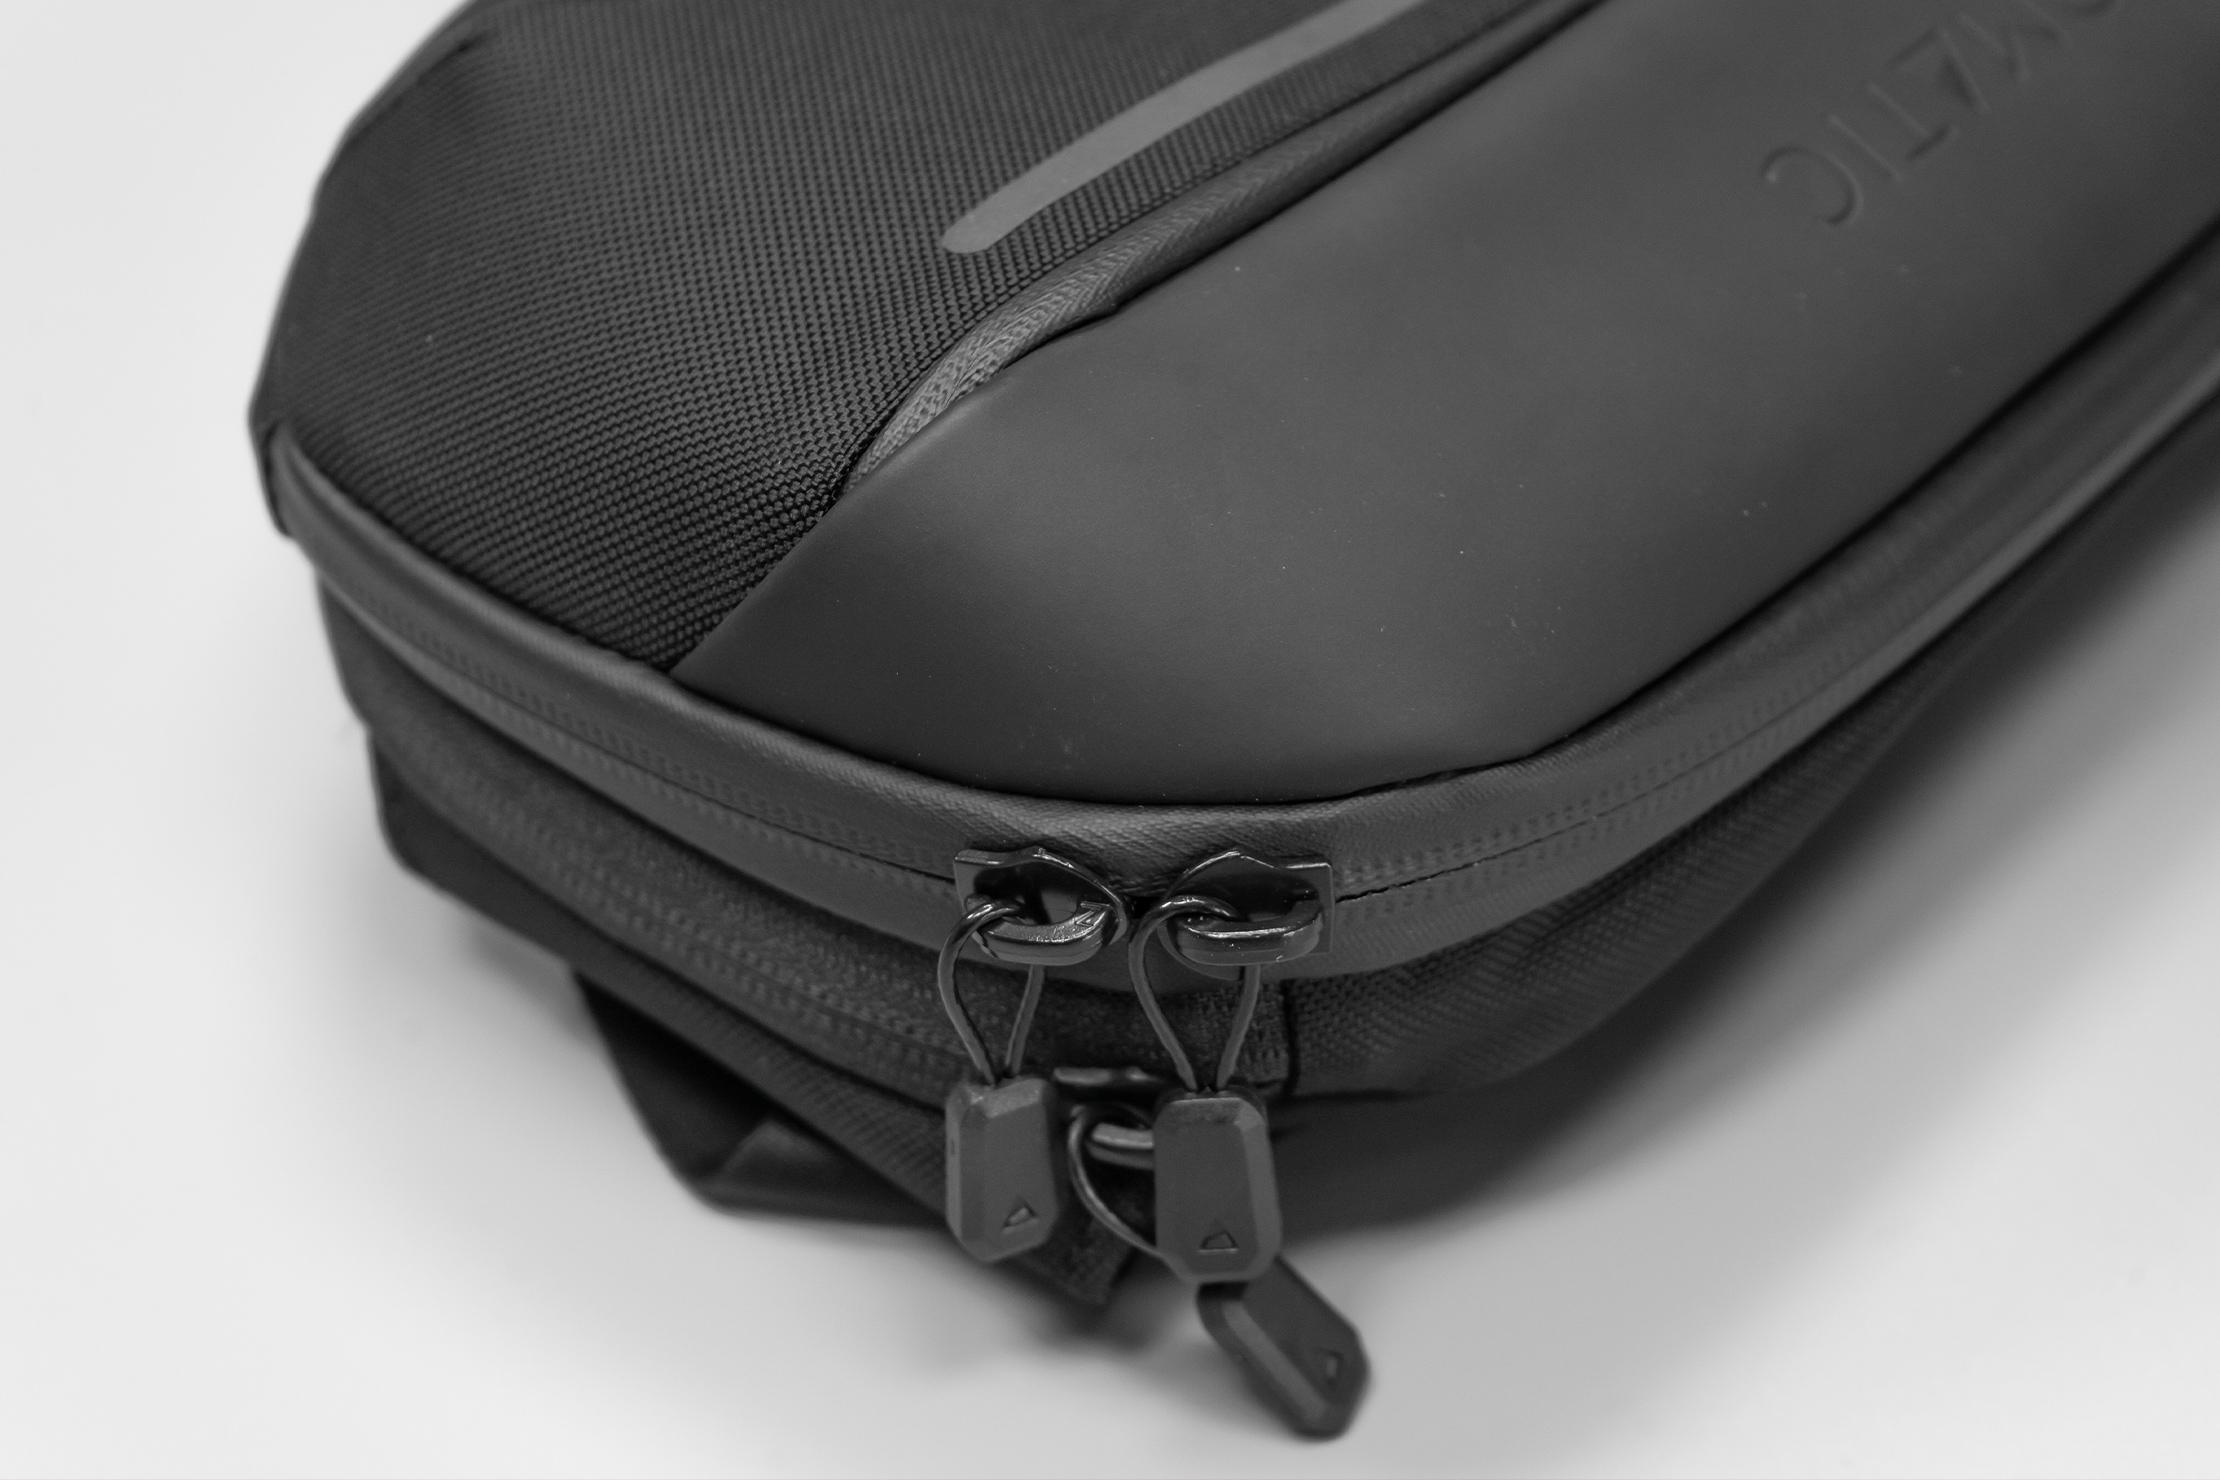 NOMATIC Navigator Sling 1L | Strong choice of materials: Tarpaulin, nylon, and metal wire zipper pulls